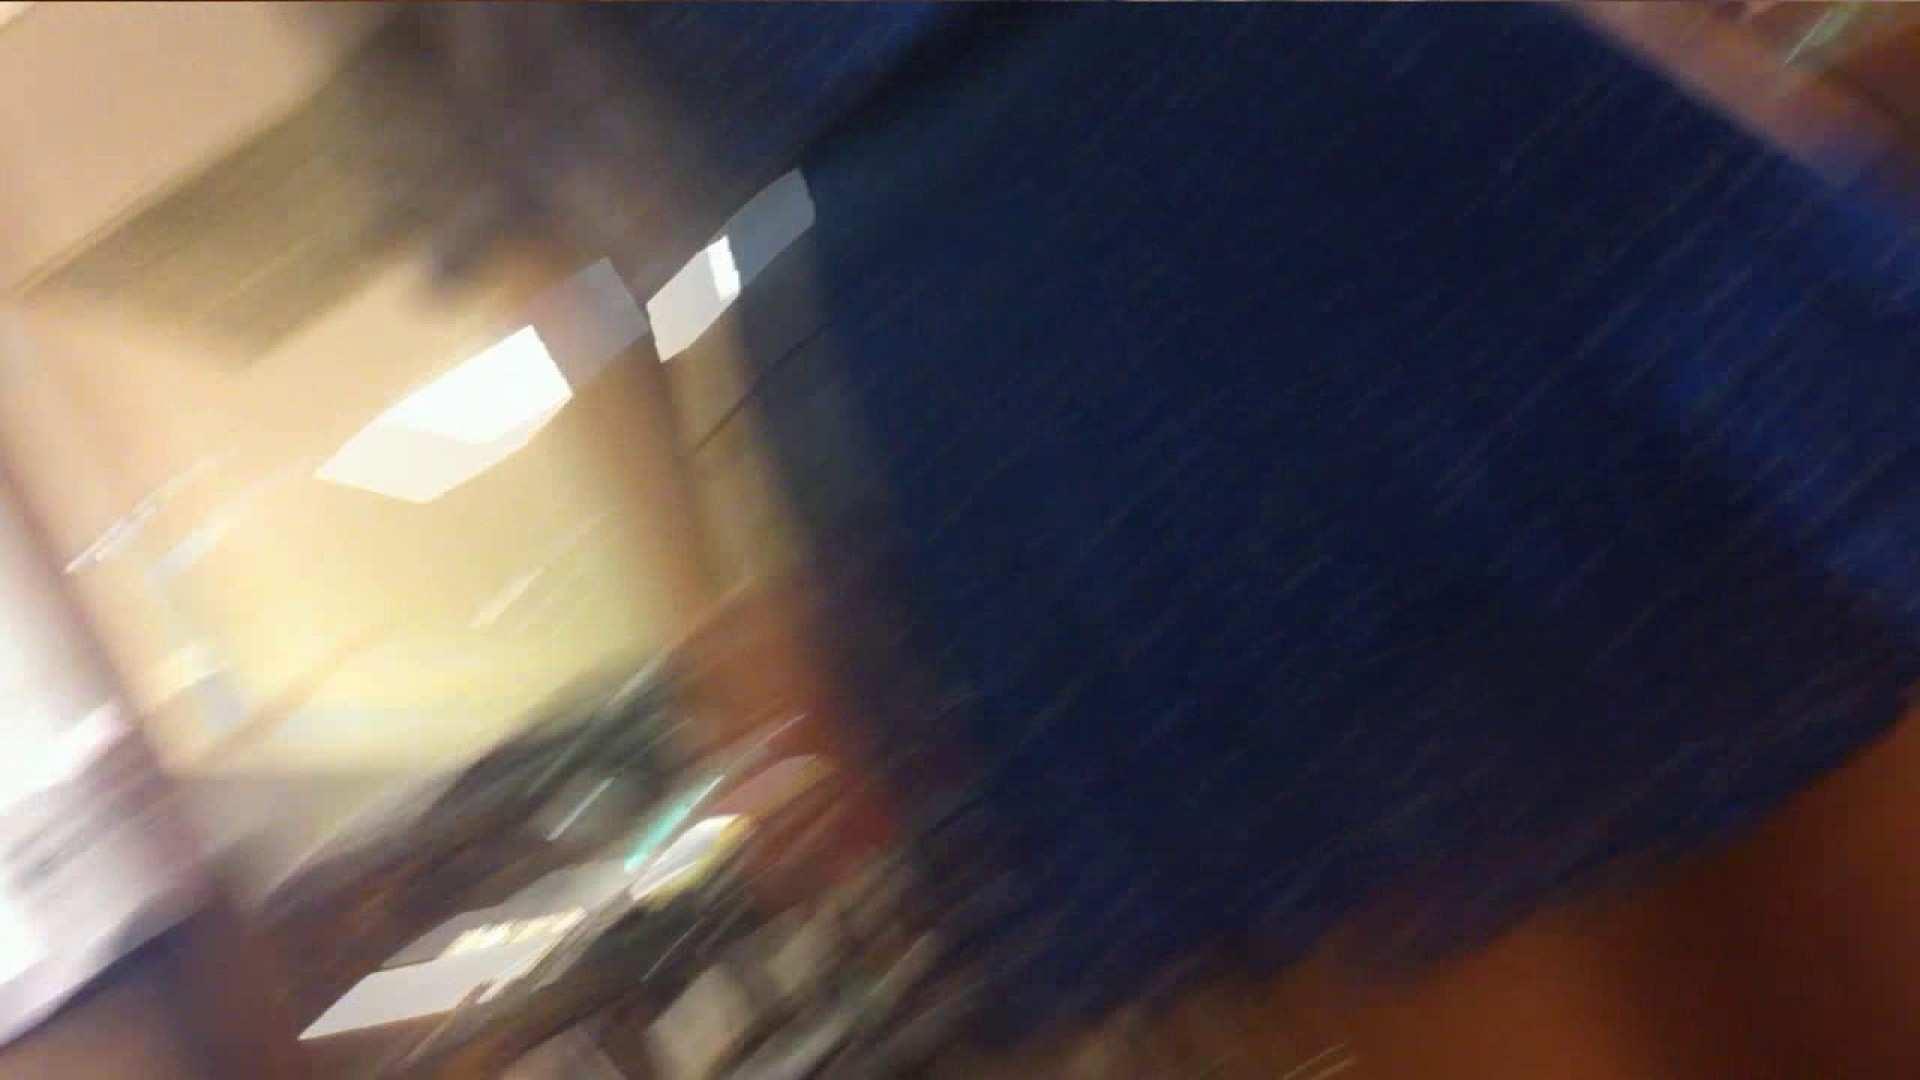 vol.34 美人アパレル胸チラ&パンチラ メガネ属性っていいよね♥ 新入生パンチラ ヌード画像 104pic 40